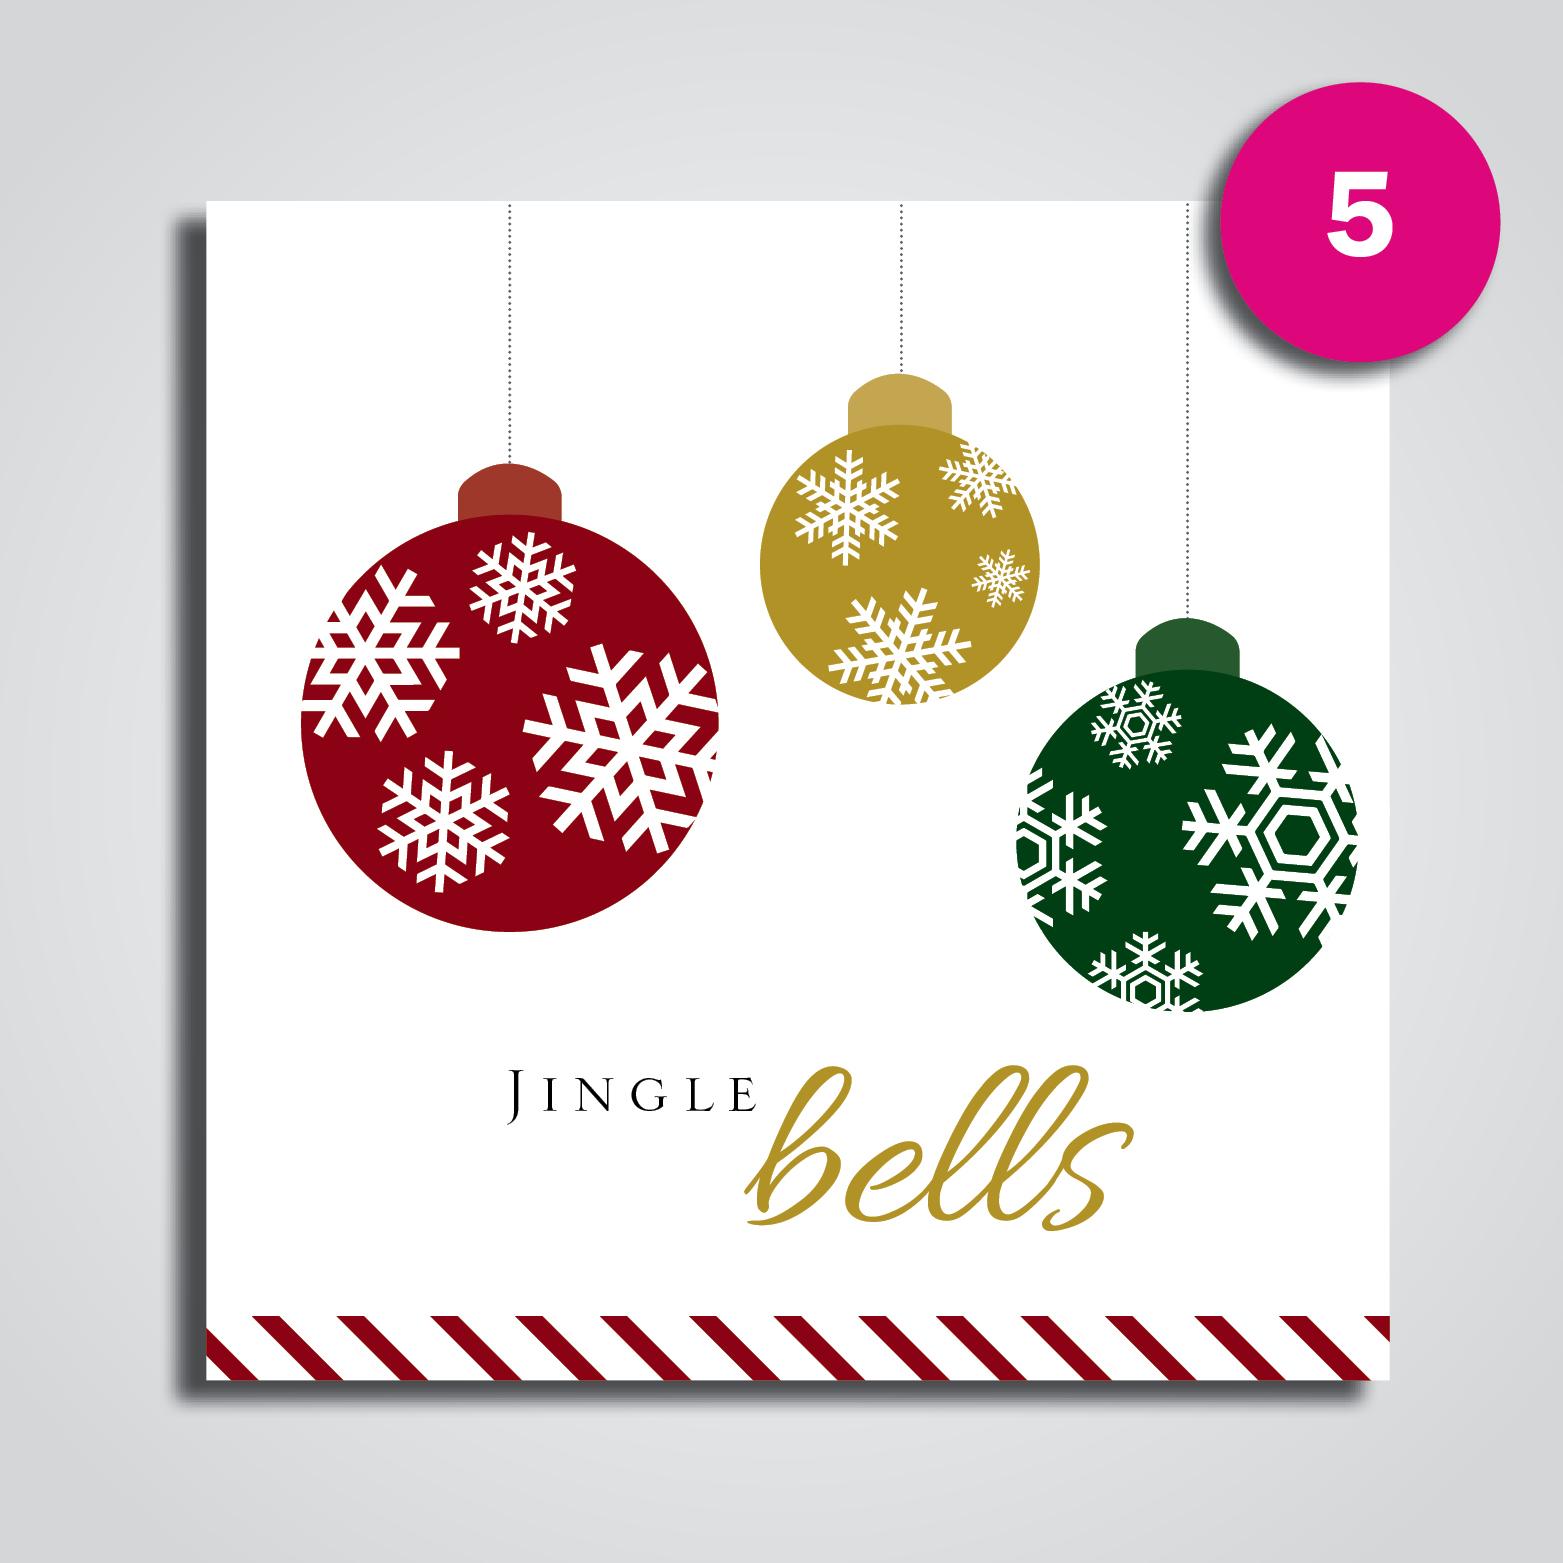 Christmas Card Design.Christmas Card Designs Telford Reprographics Ltd